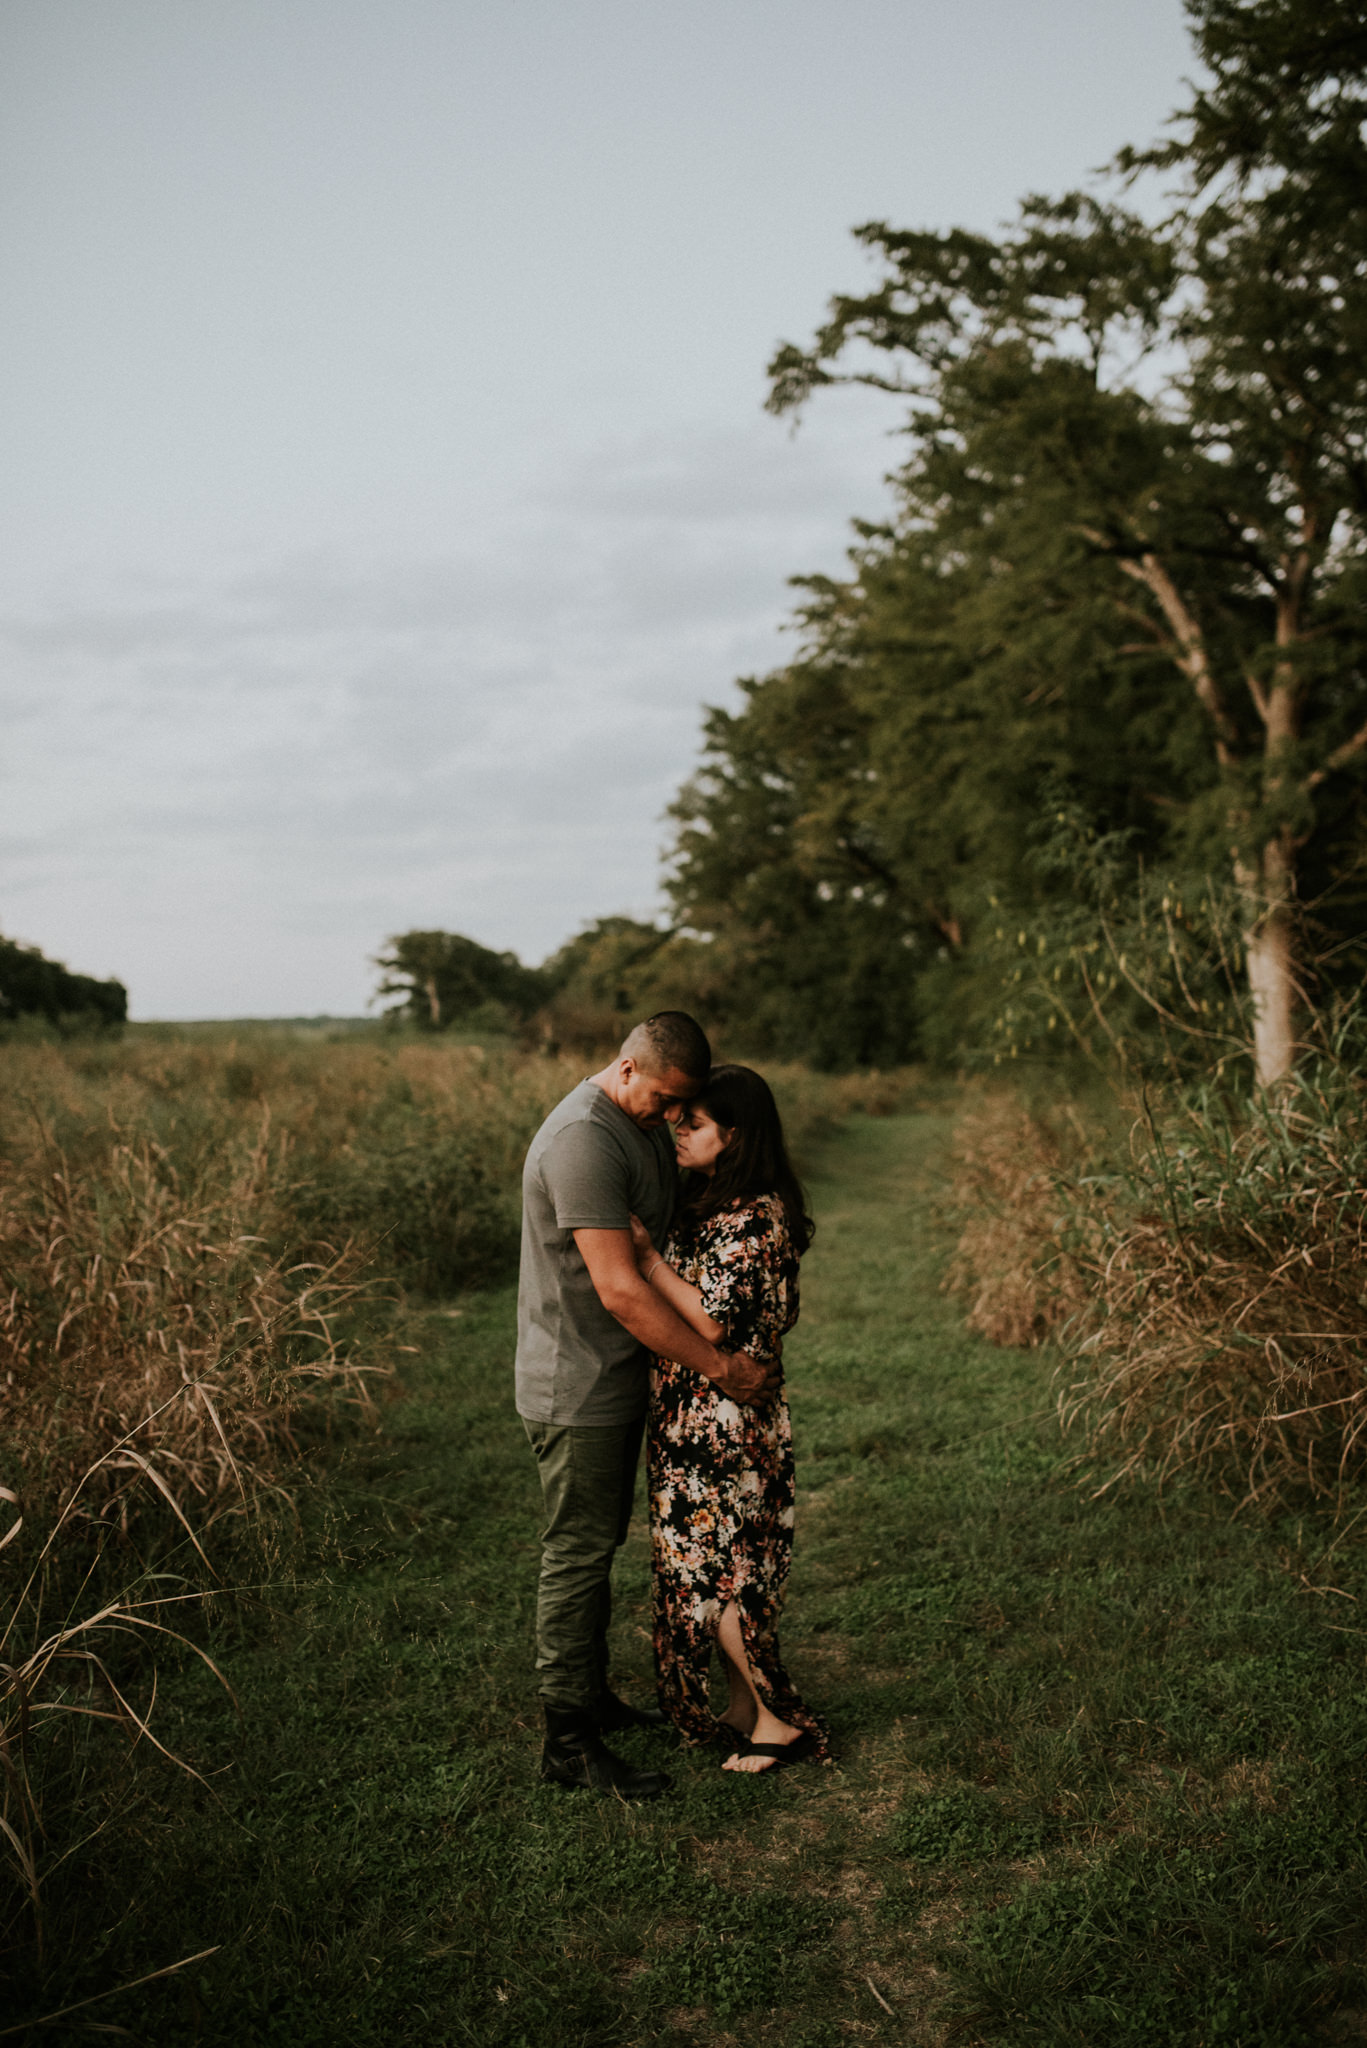 Kerlyn-Van-Gelder-Photography-Texas-Photographer78.jpg